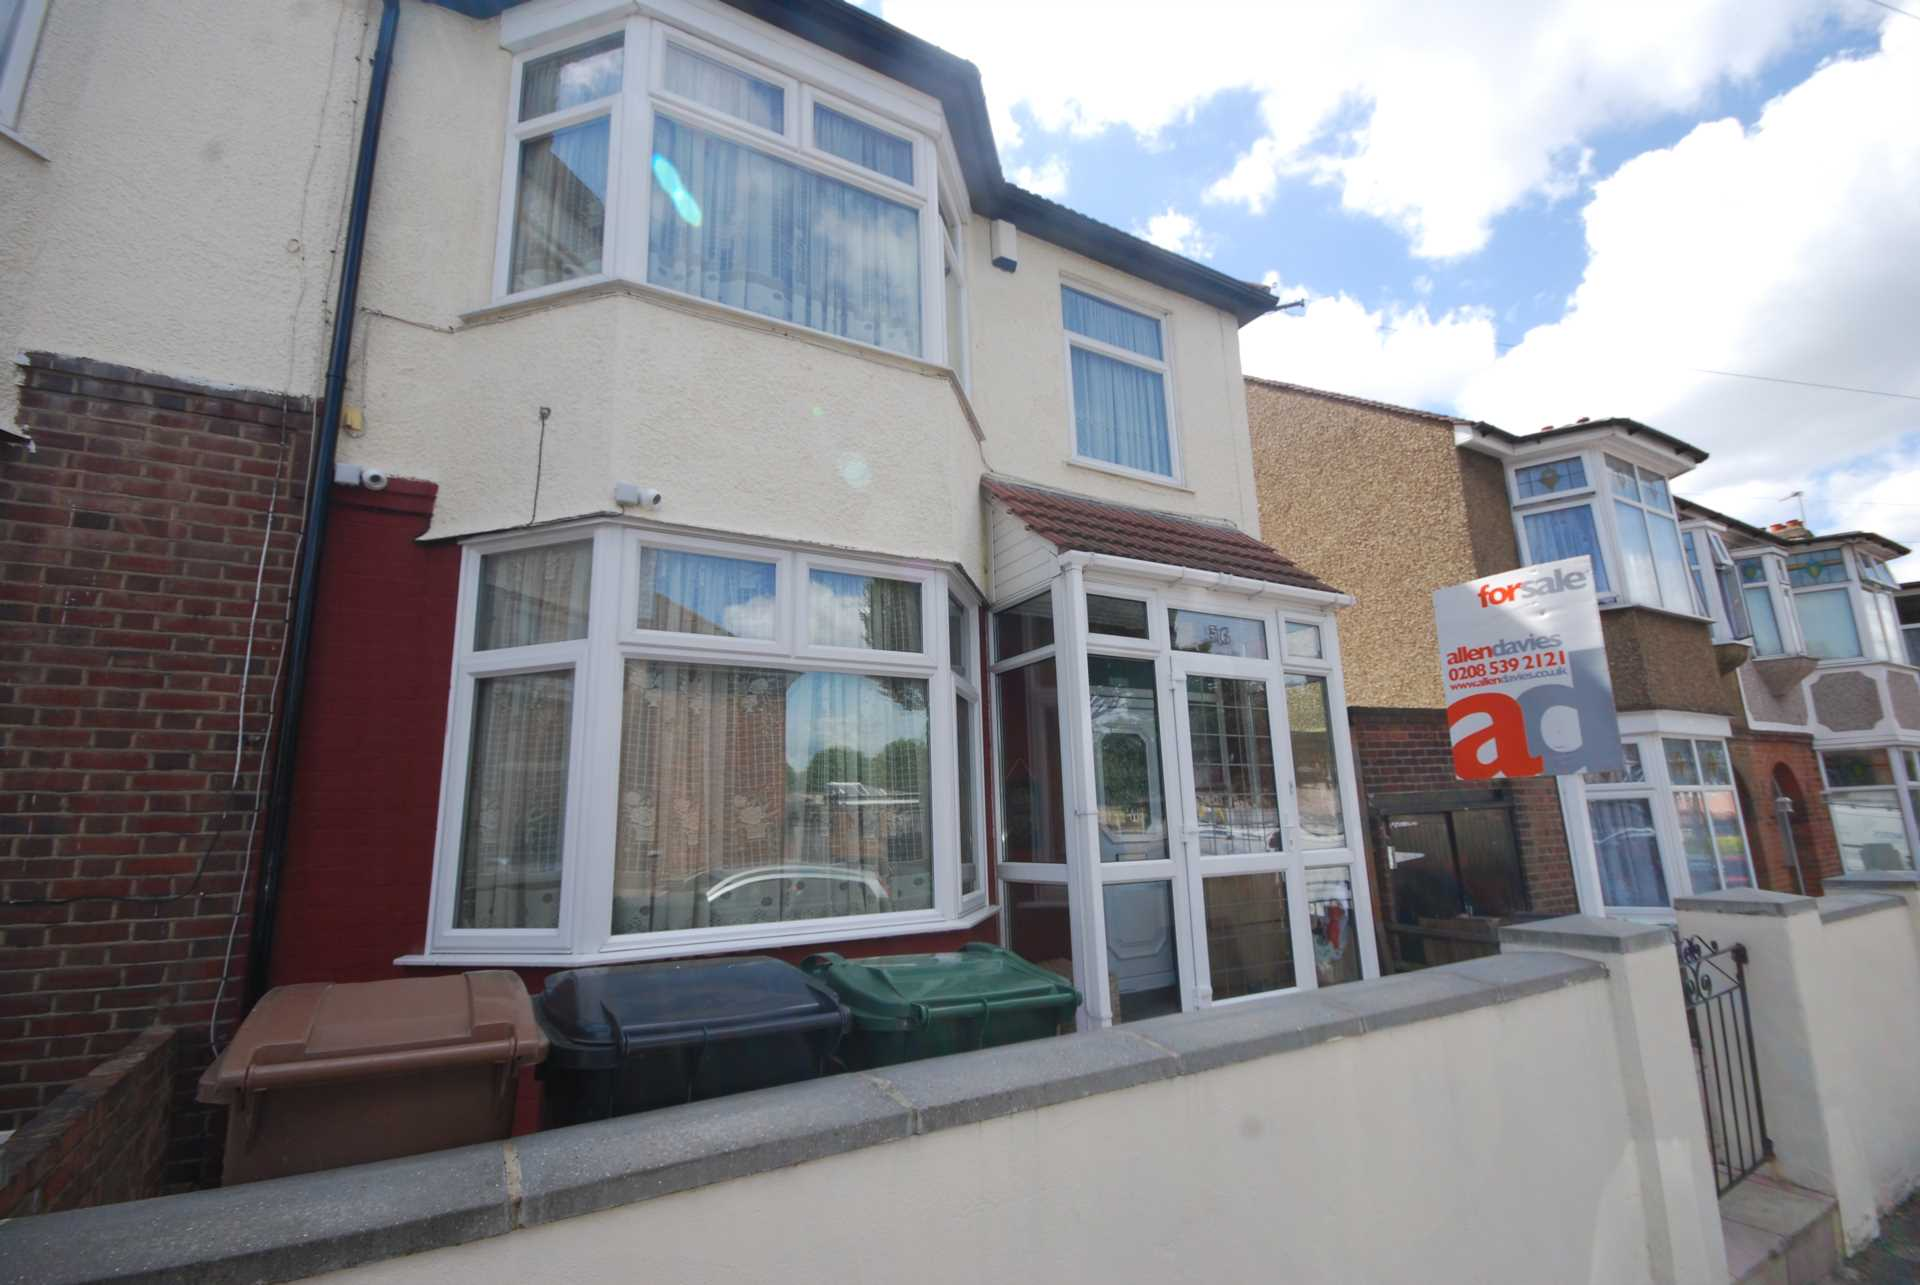 Chesterfield Road, Leyton, E10, Image 1